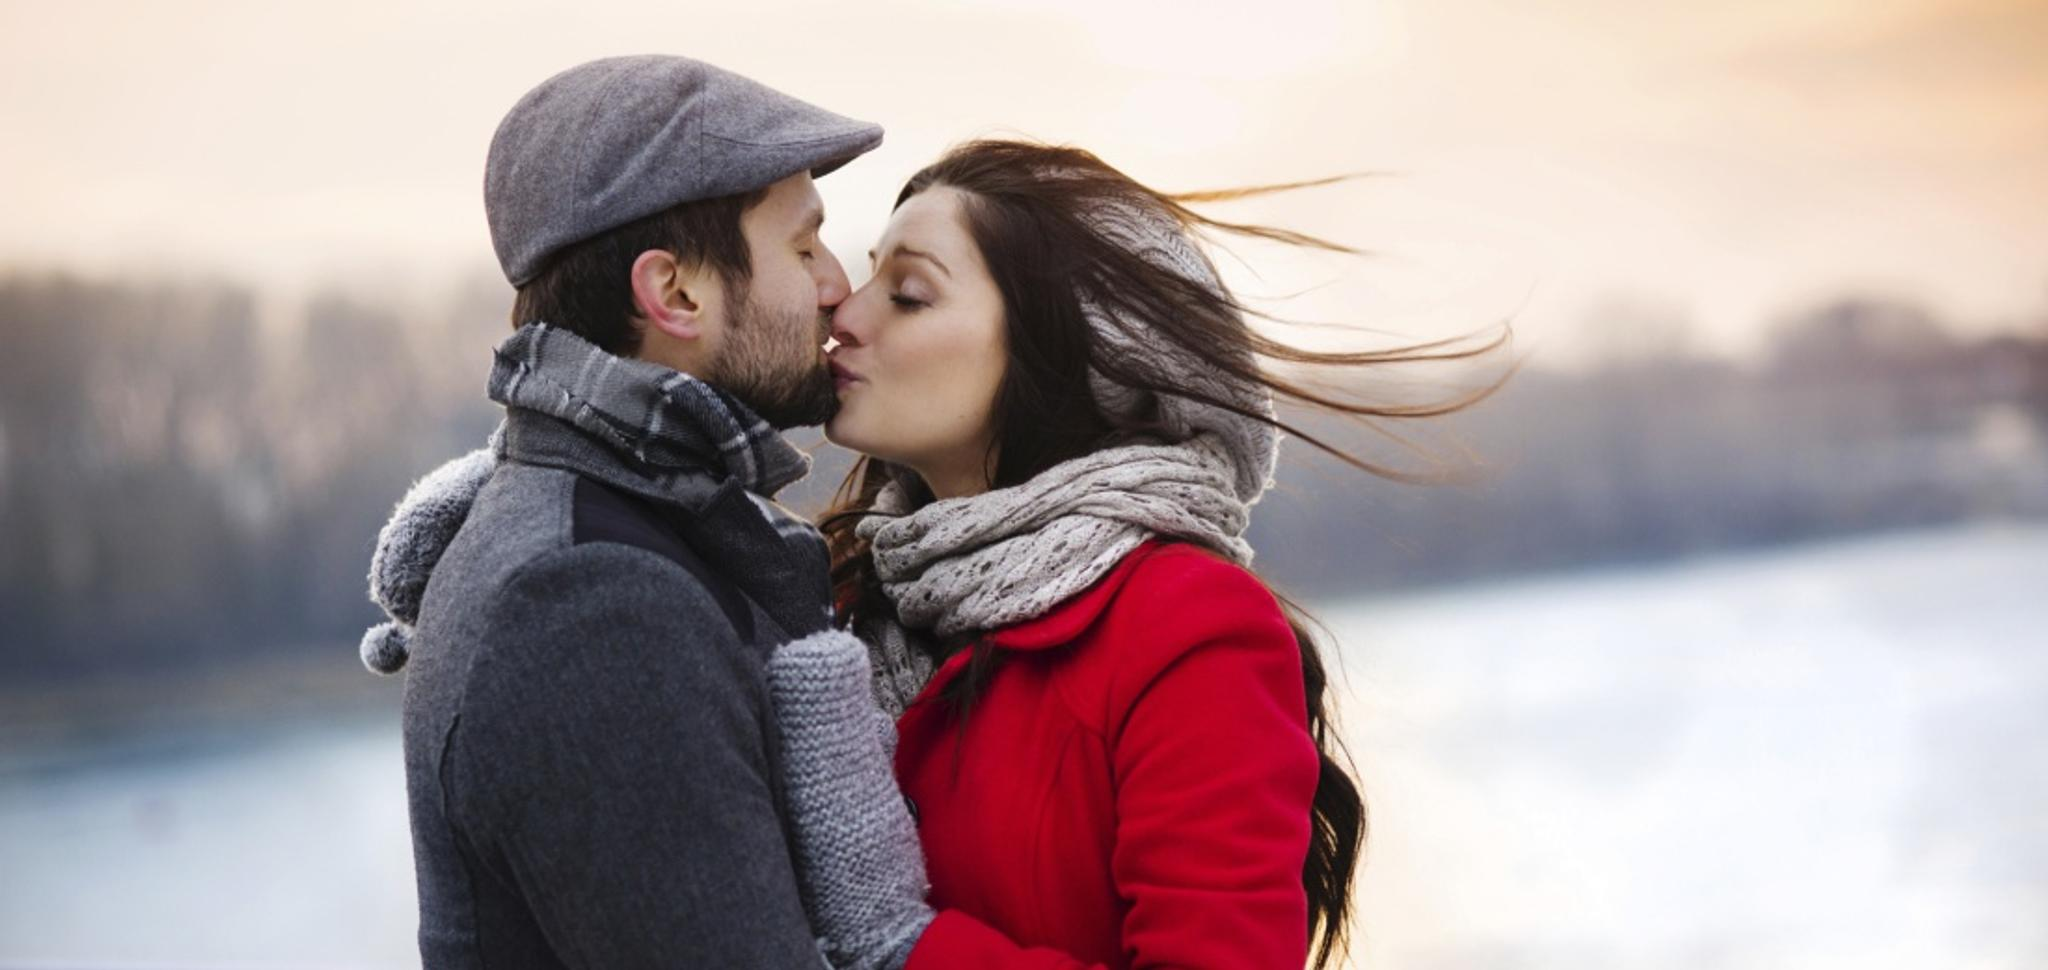 dating rakkaus suhteet